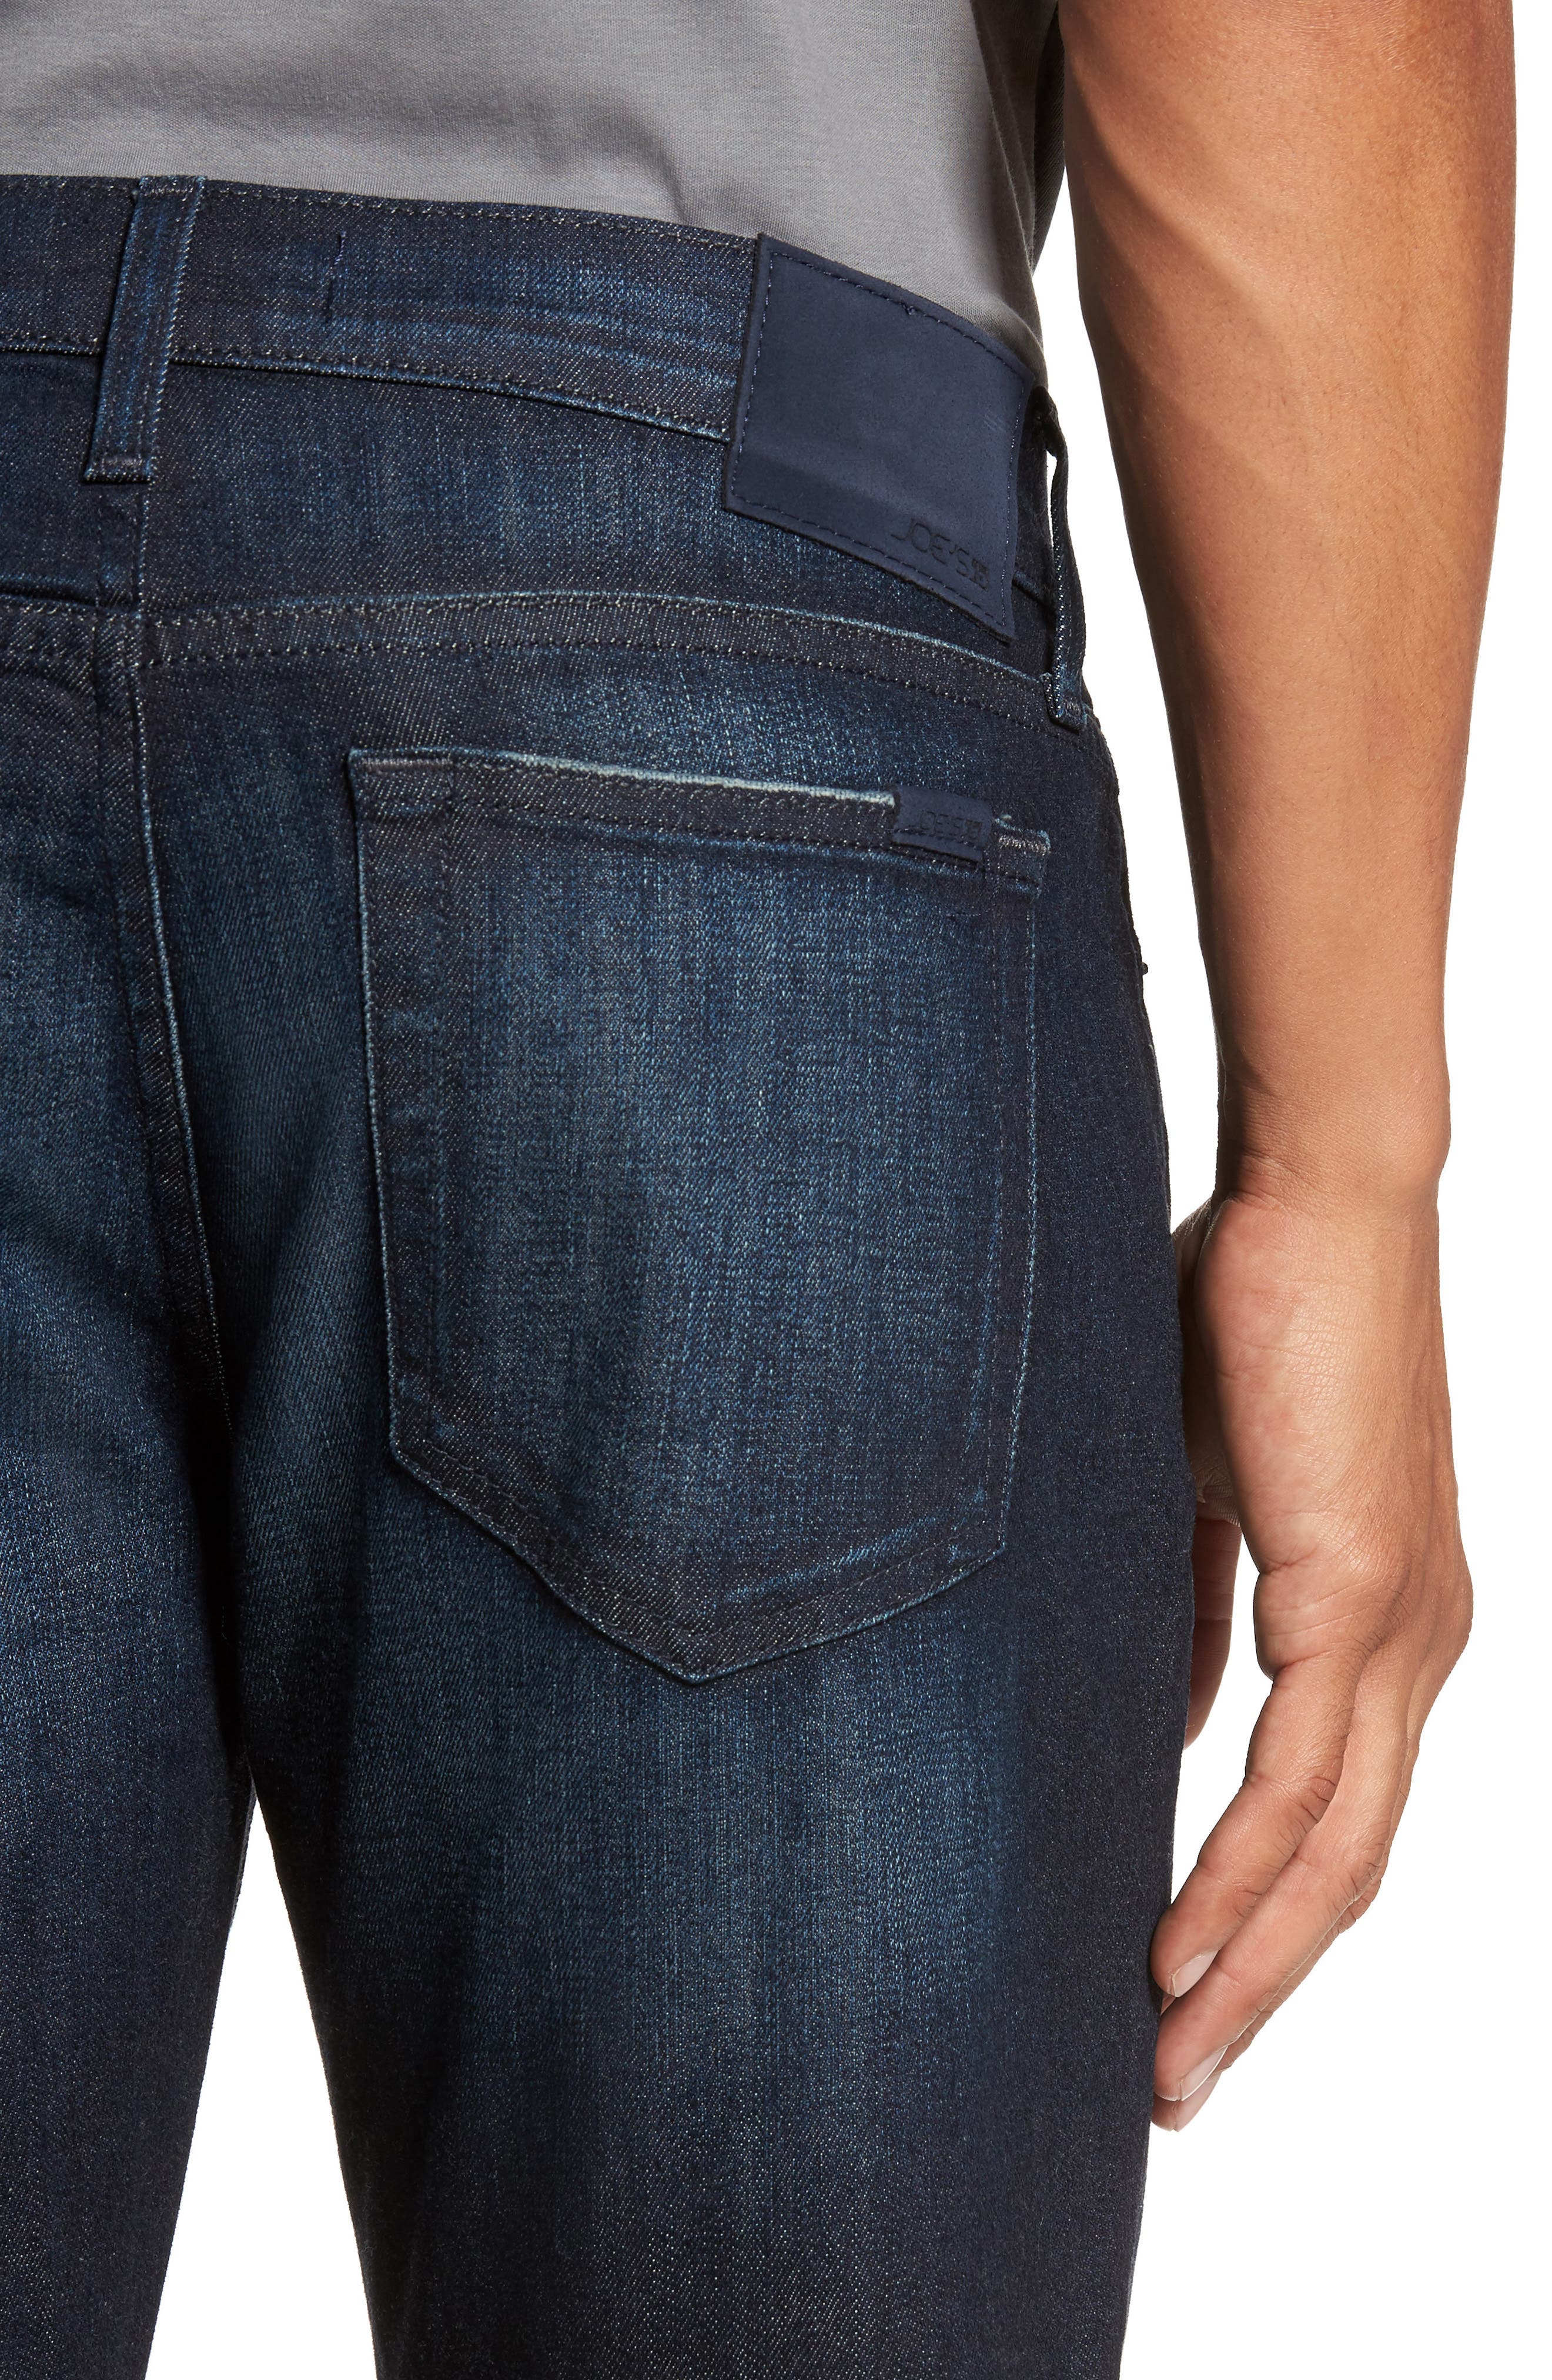 Brixton Slim Straight Fit Jeans,                             Alternate thumbnail 4, color,                             405